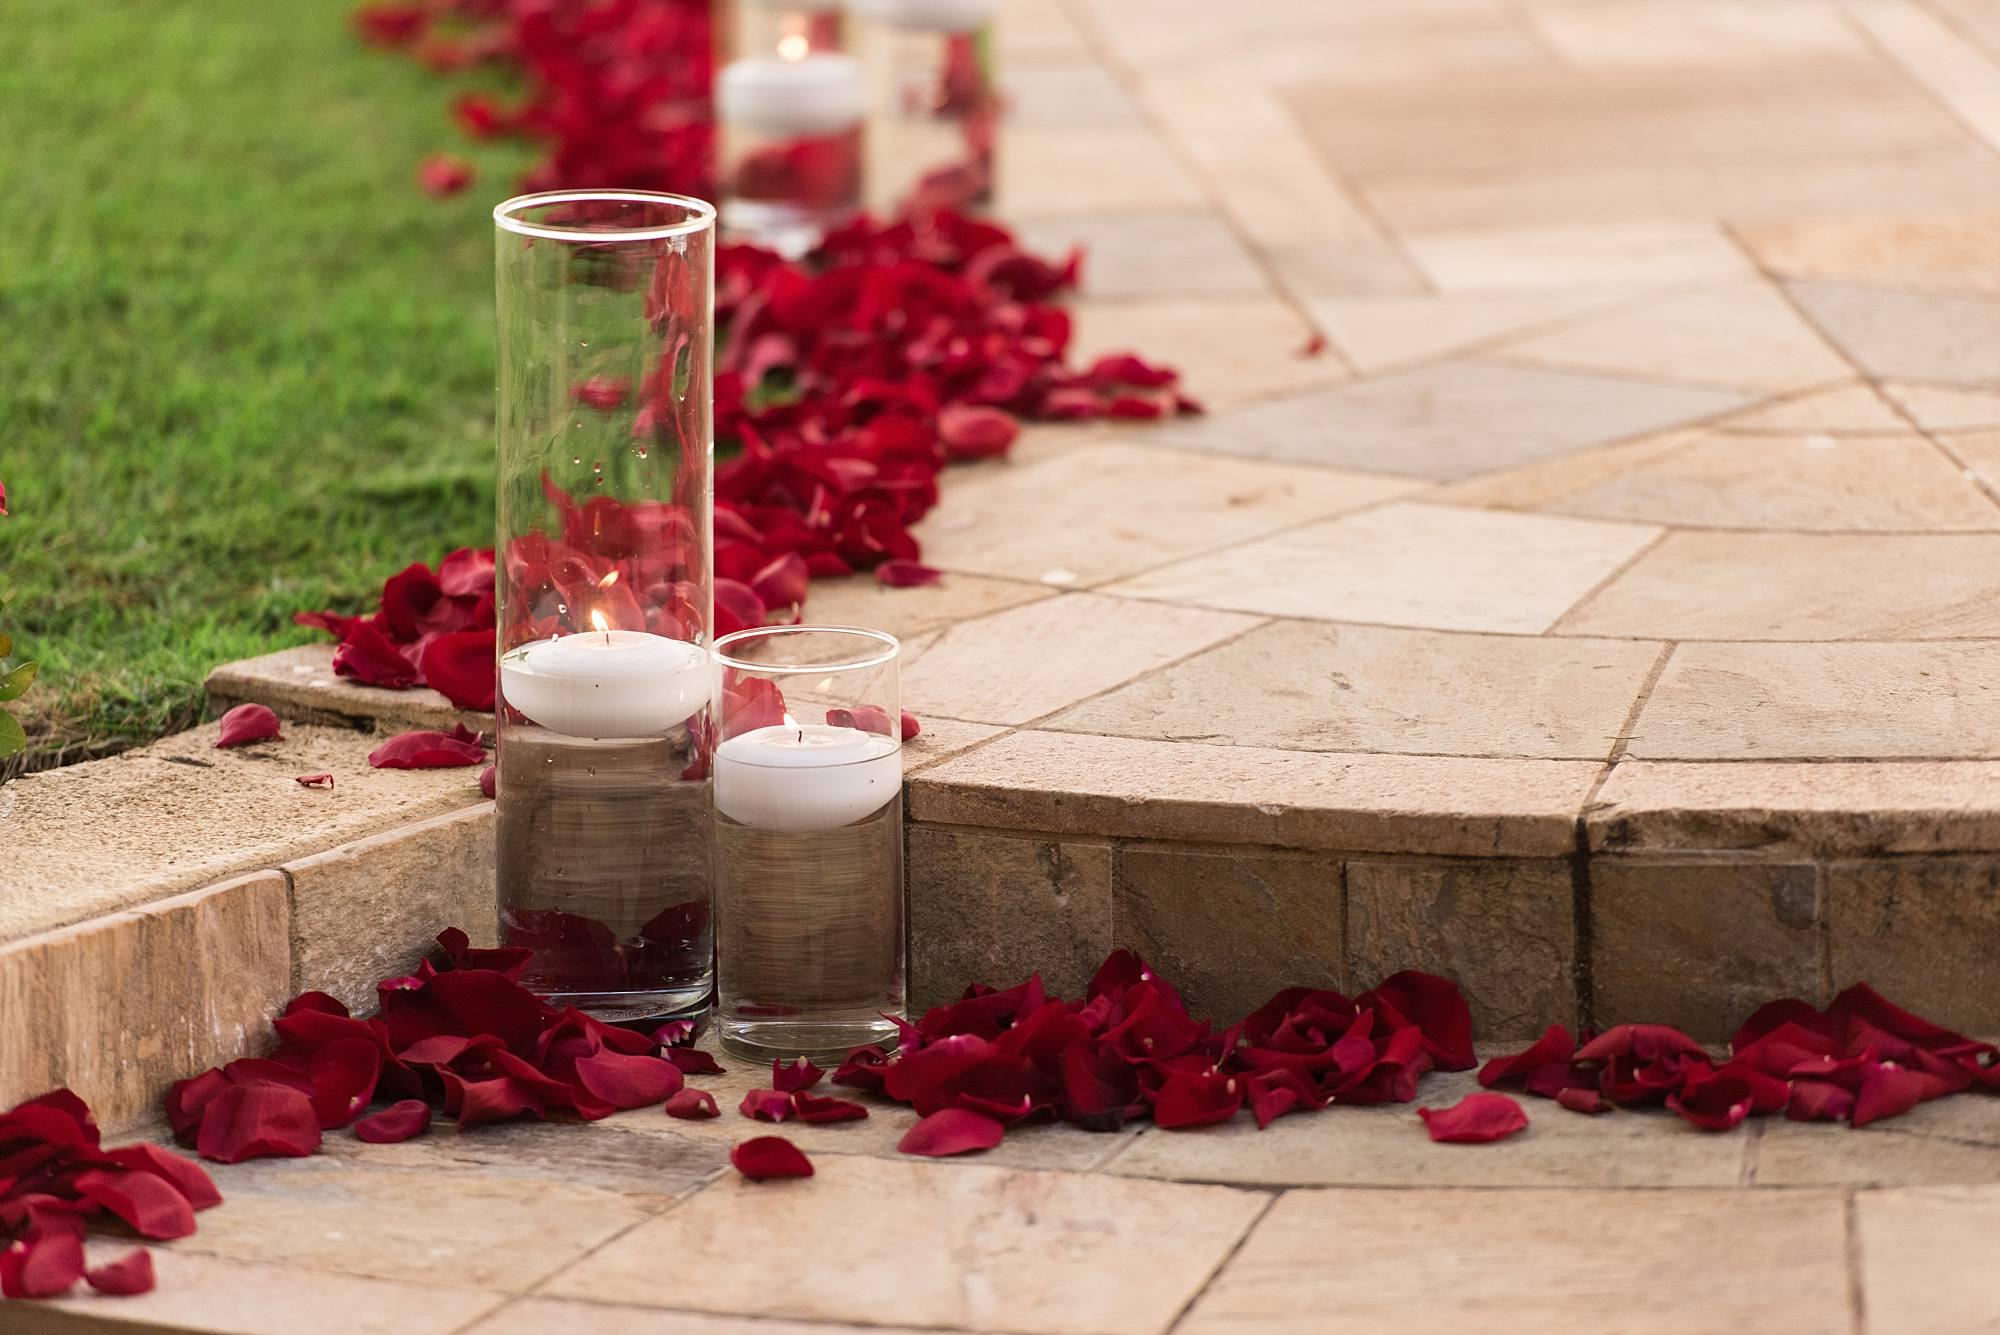 Candles adn flower petals on walkway